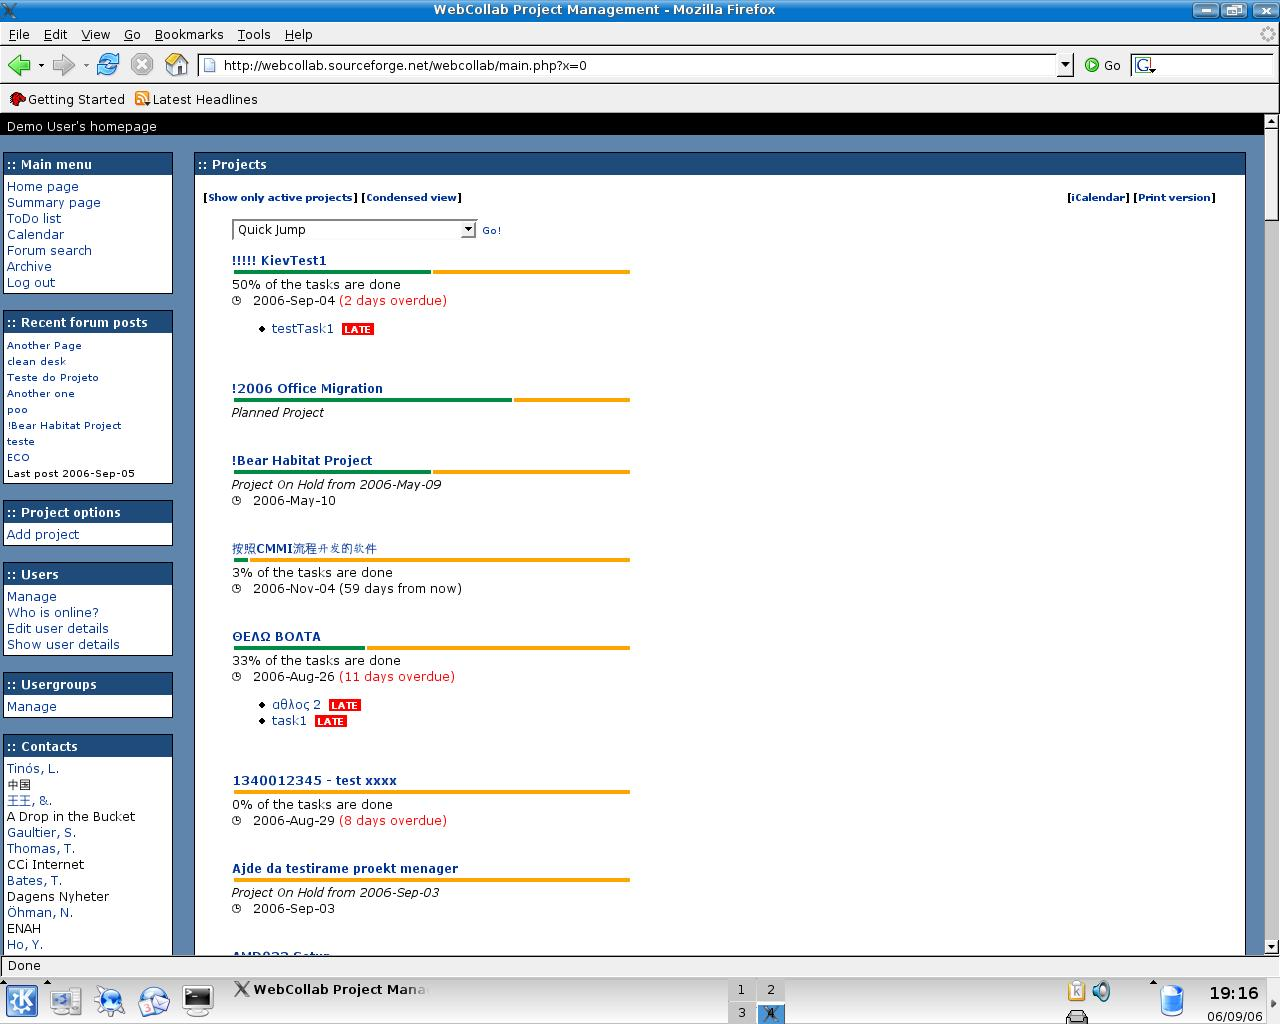 webcollab main_page http://in.linkedin.com/in/prashantkumarsharma